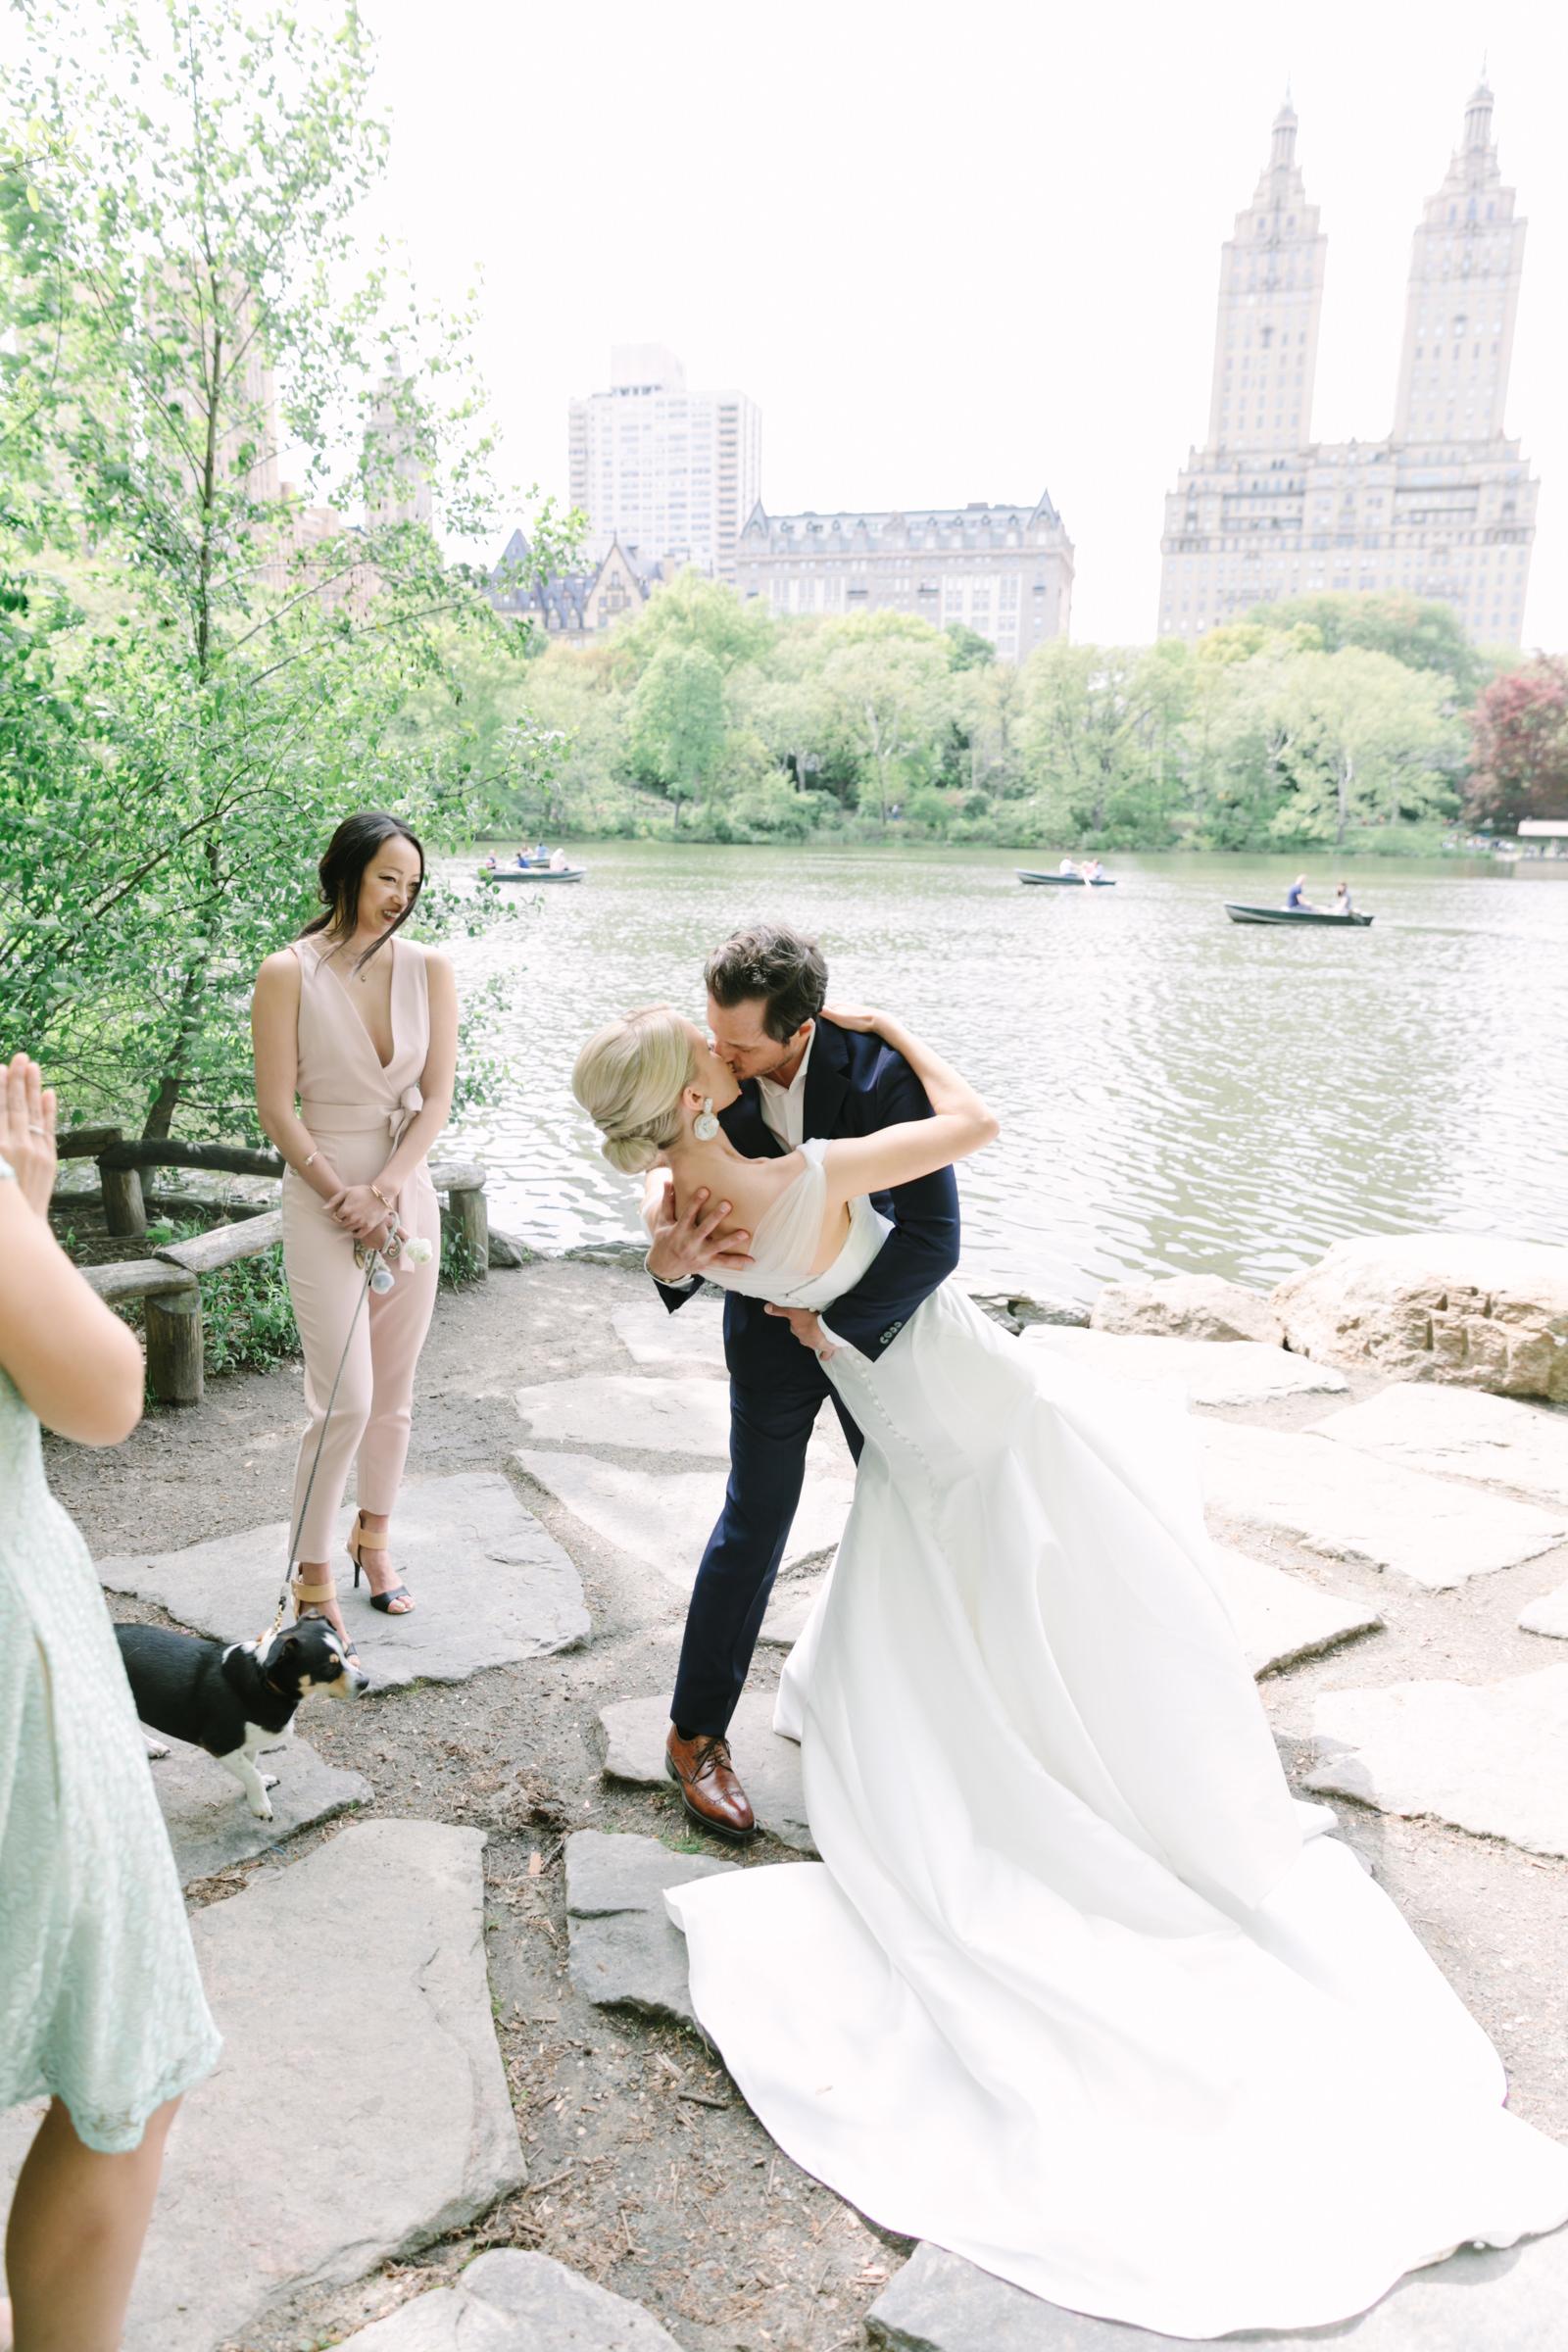 Intimate-NYC_wedding_ by Tanya Isaeva-105.jpg